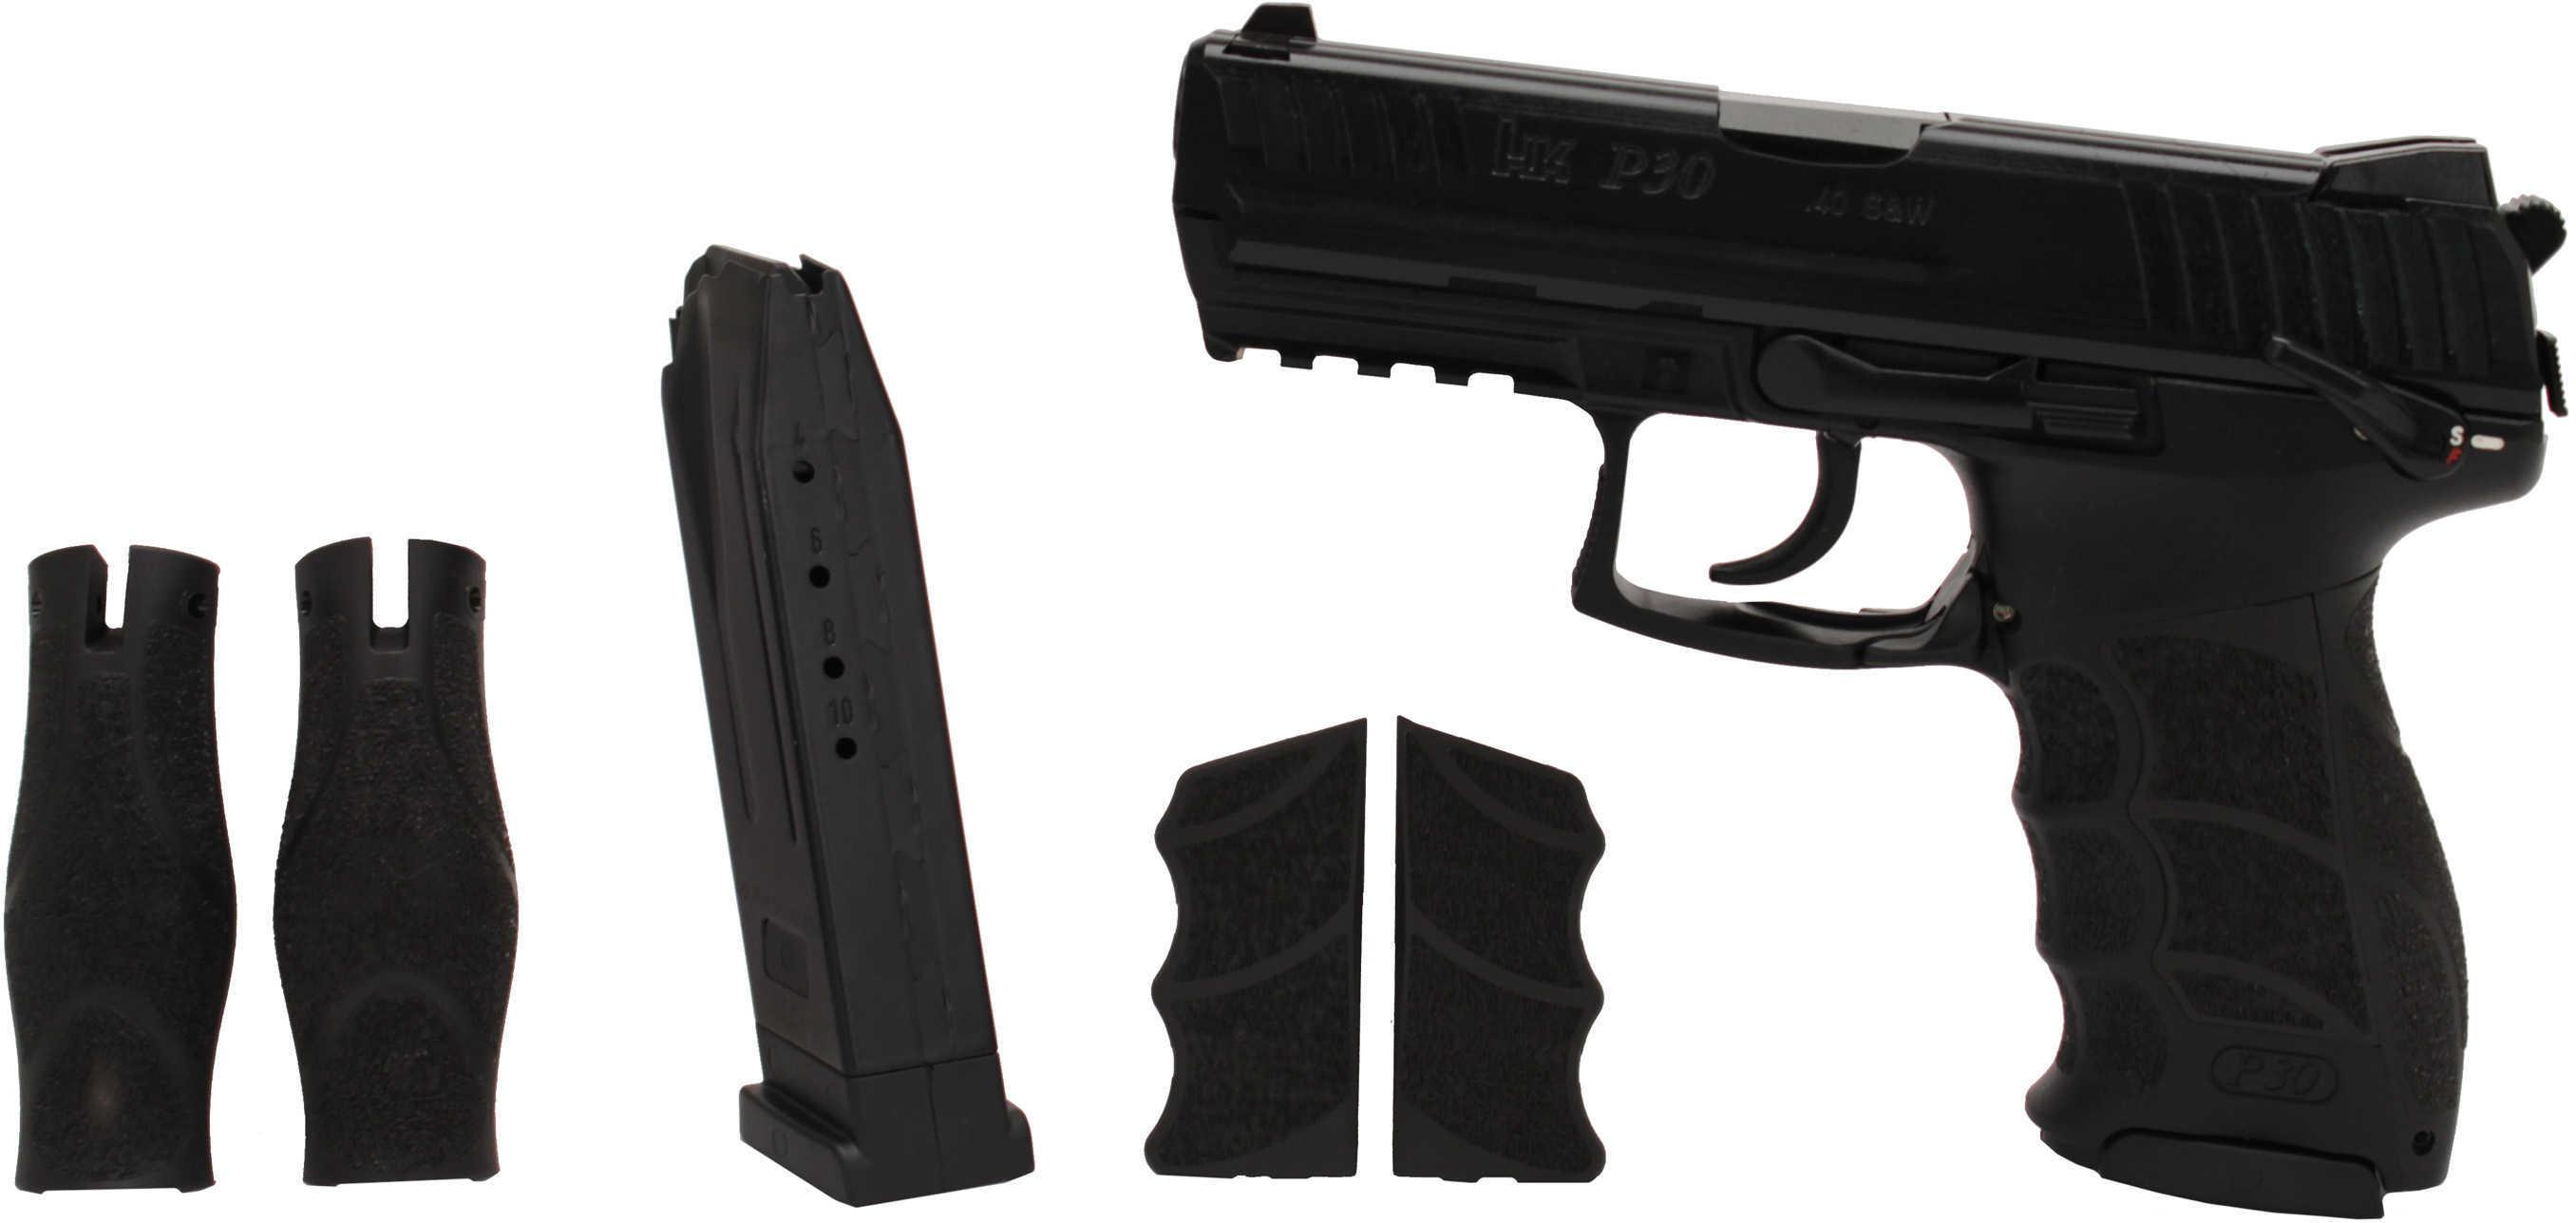 "Heckler & Koch P30S V3 40 S&W 3.86"" Barrel 10 Round Double/Single Action Ambidextrous Safety Decocker Semi Auto Pistol M734003S-A5"